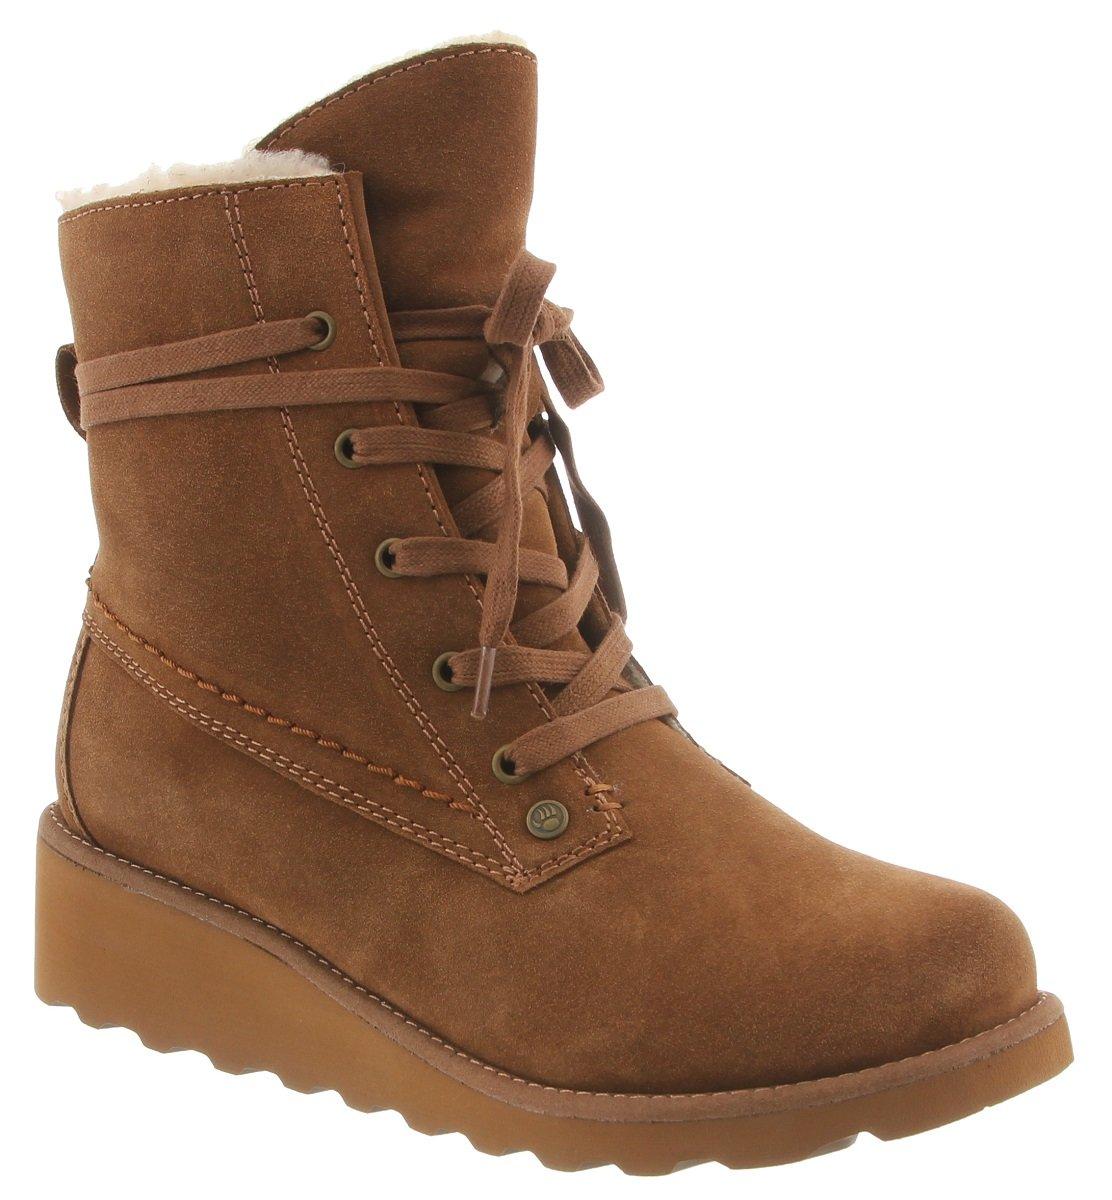 BEARPAW Women's Krista Boots B06XR5GM5N 11 B(M) US|Hickory Ii